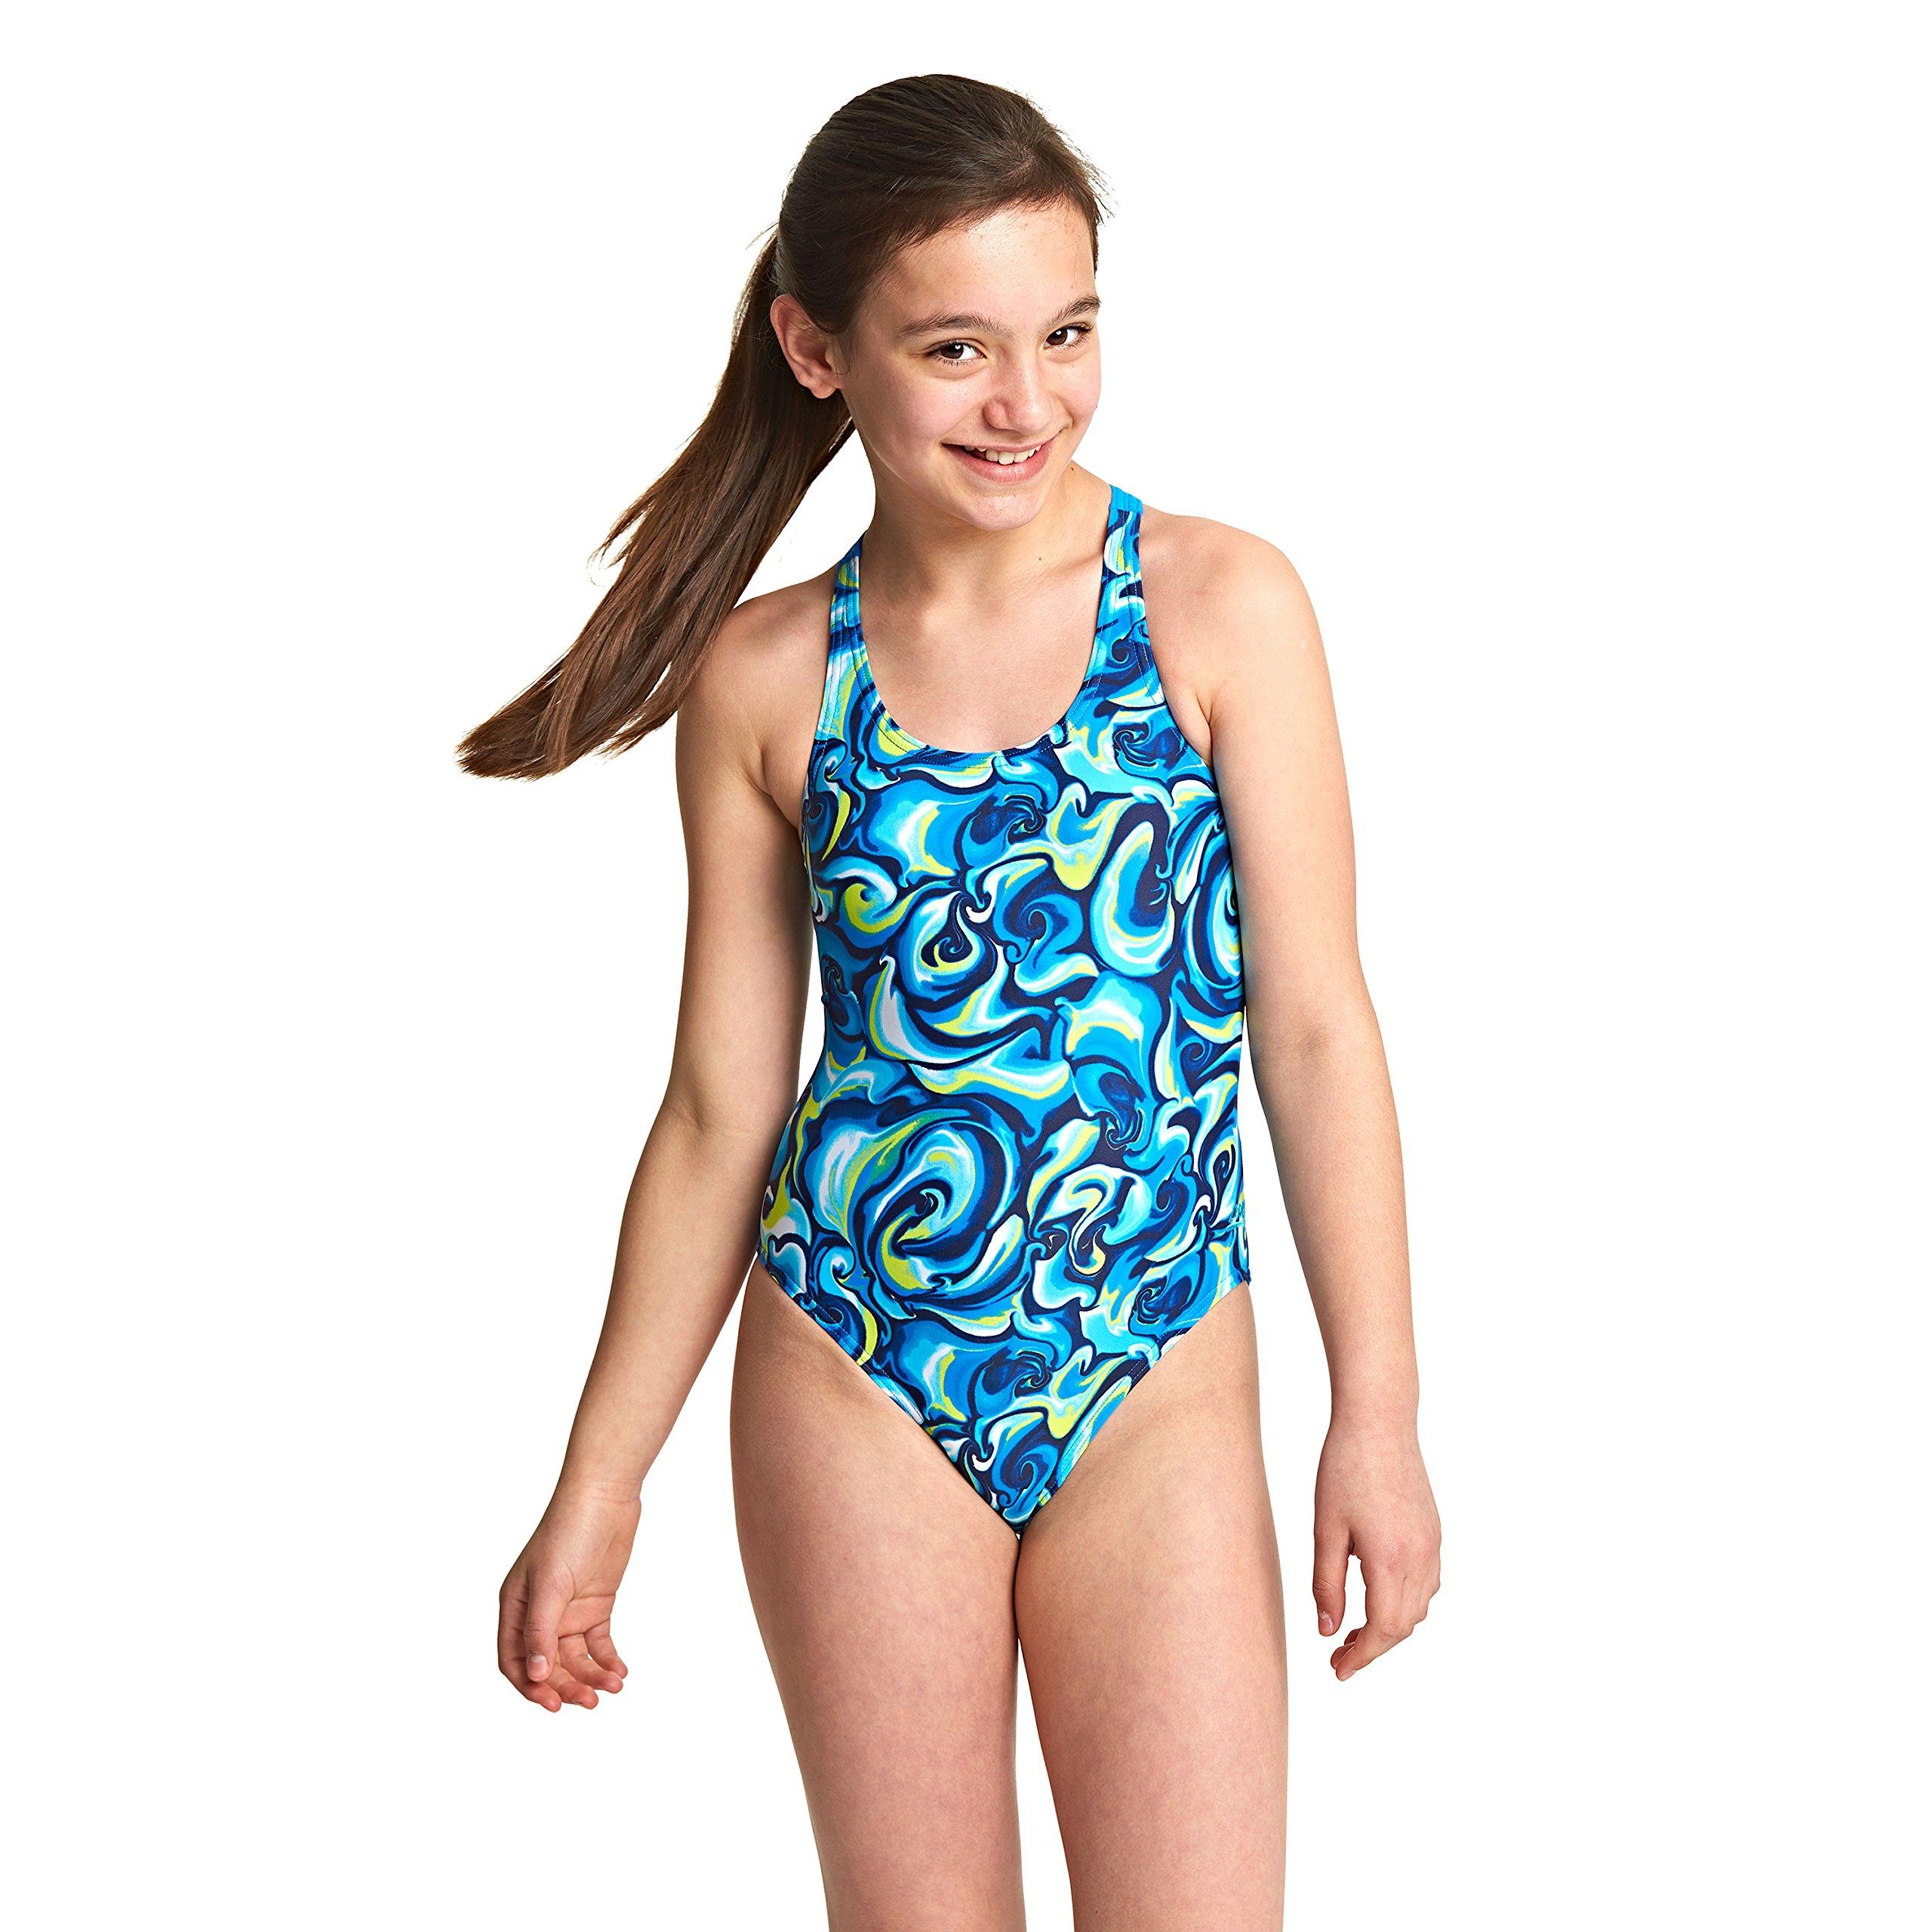 Varsany Legsuit Personalised Girls Swimming Costume one Piece Kids Swimsuit Bathing Suit Swimwear Childrens